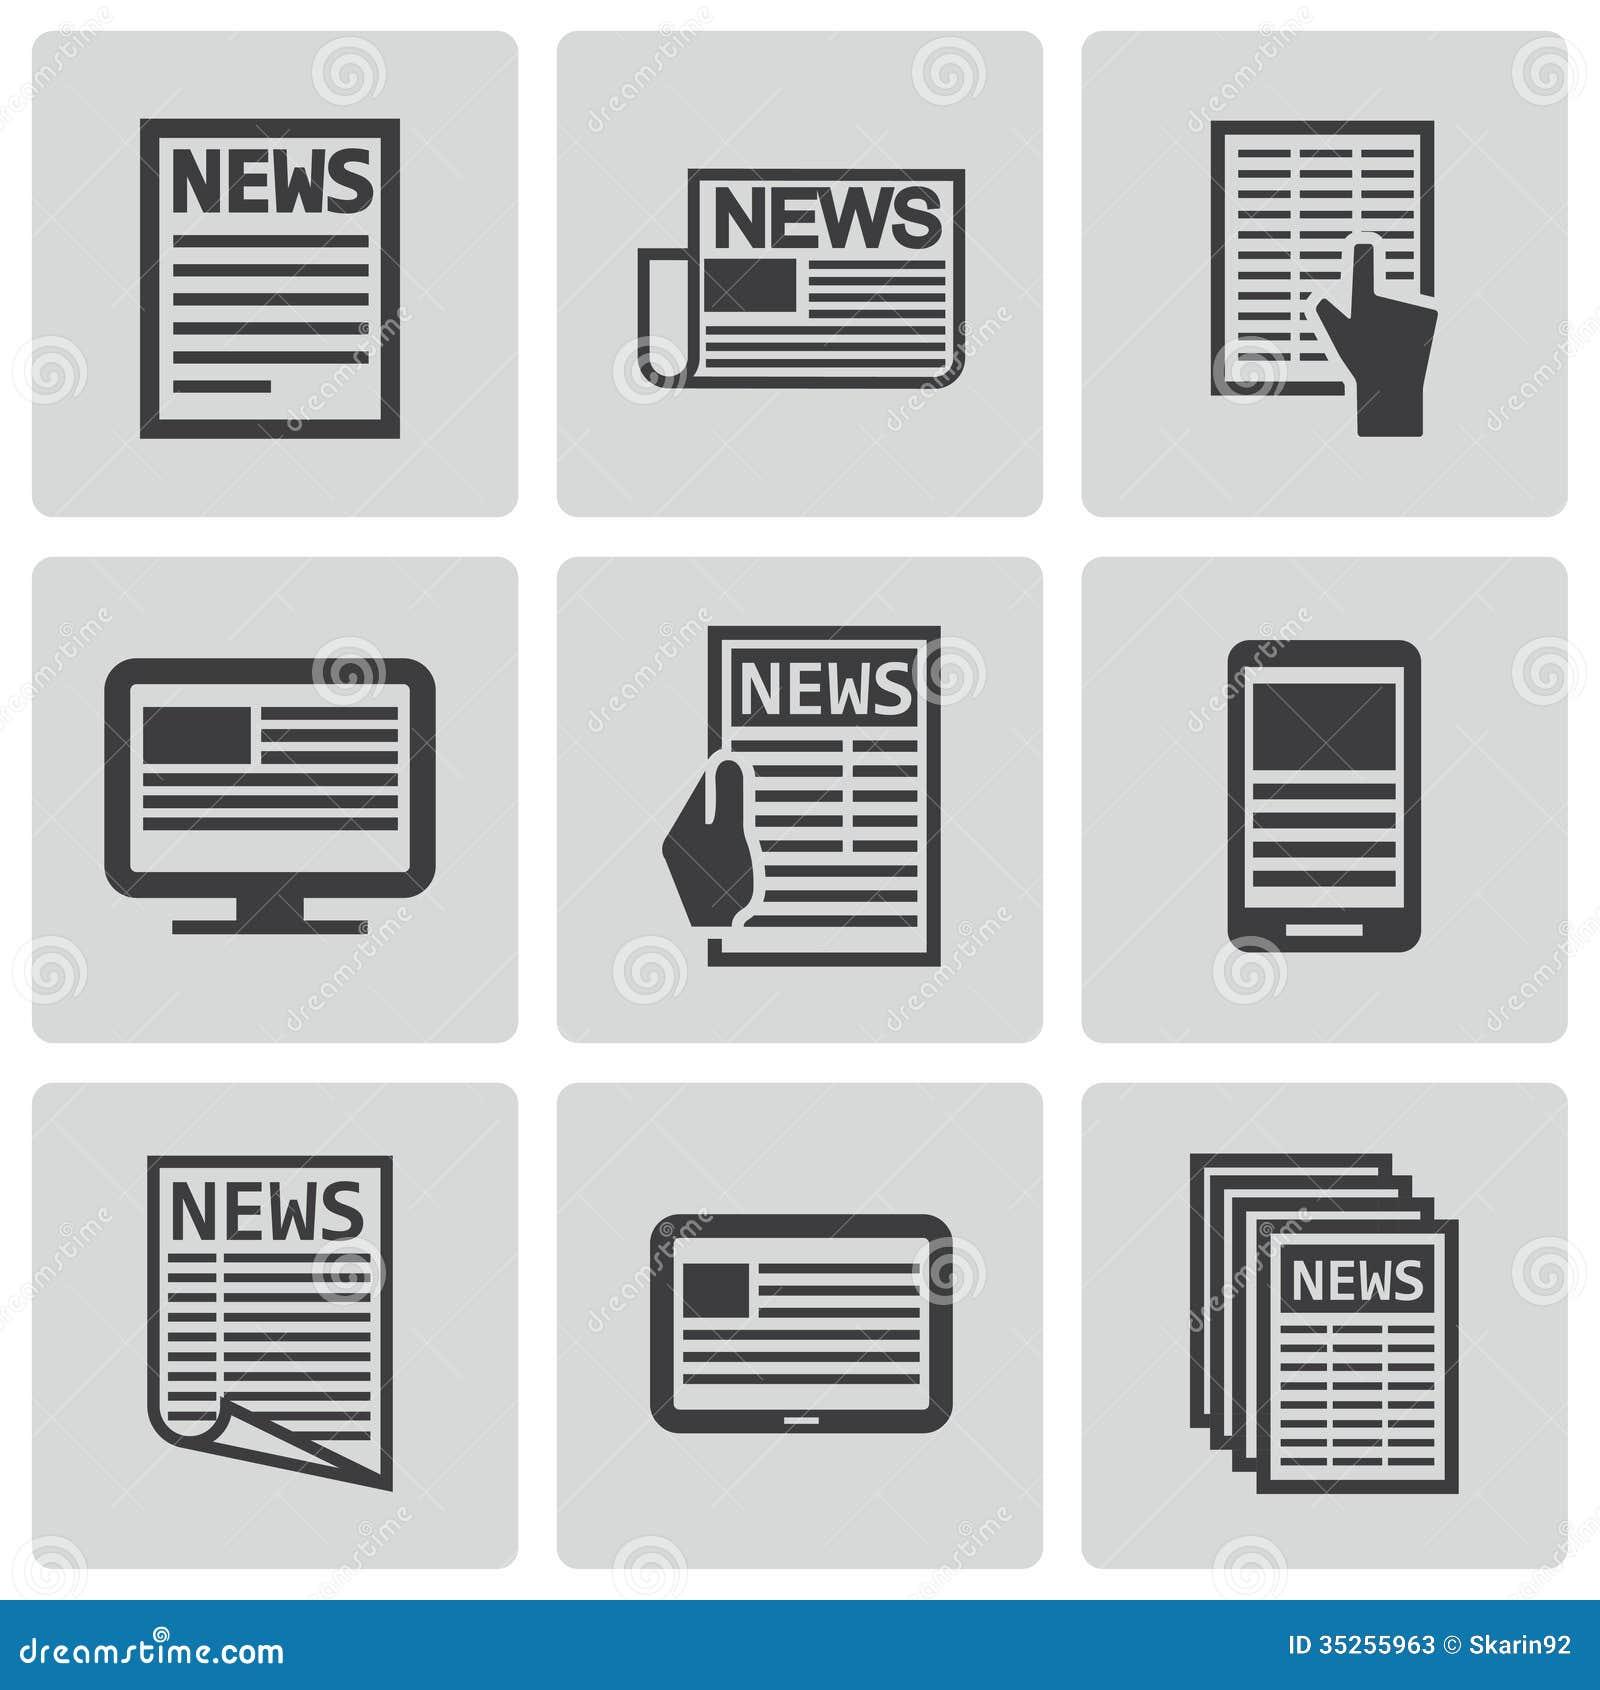 vector black newspaper icons set stock photos image restaurant clip art borders restaurant clip art images